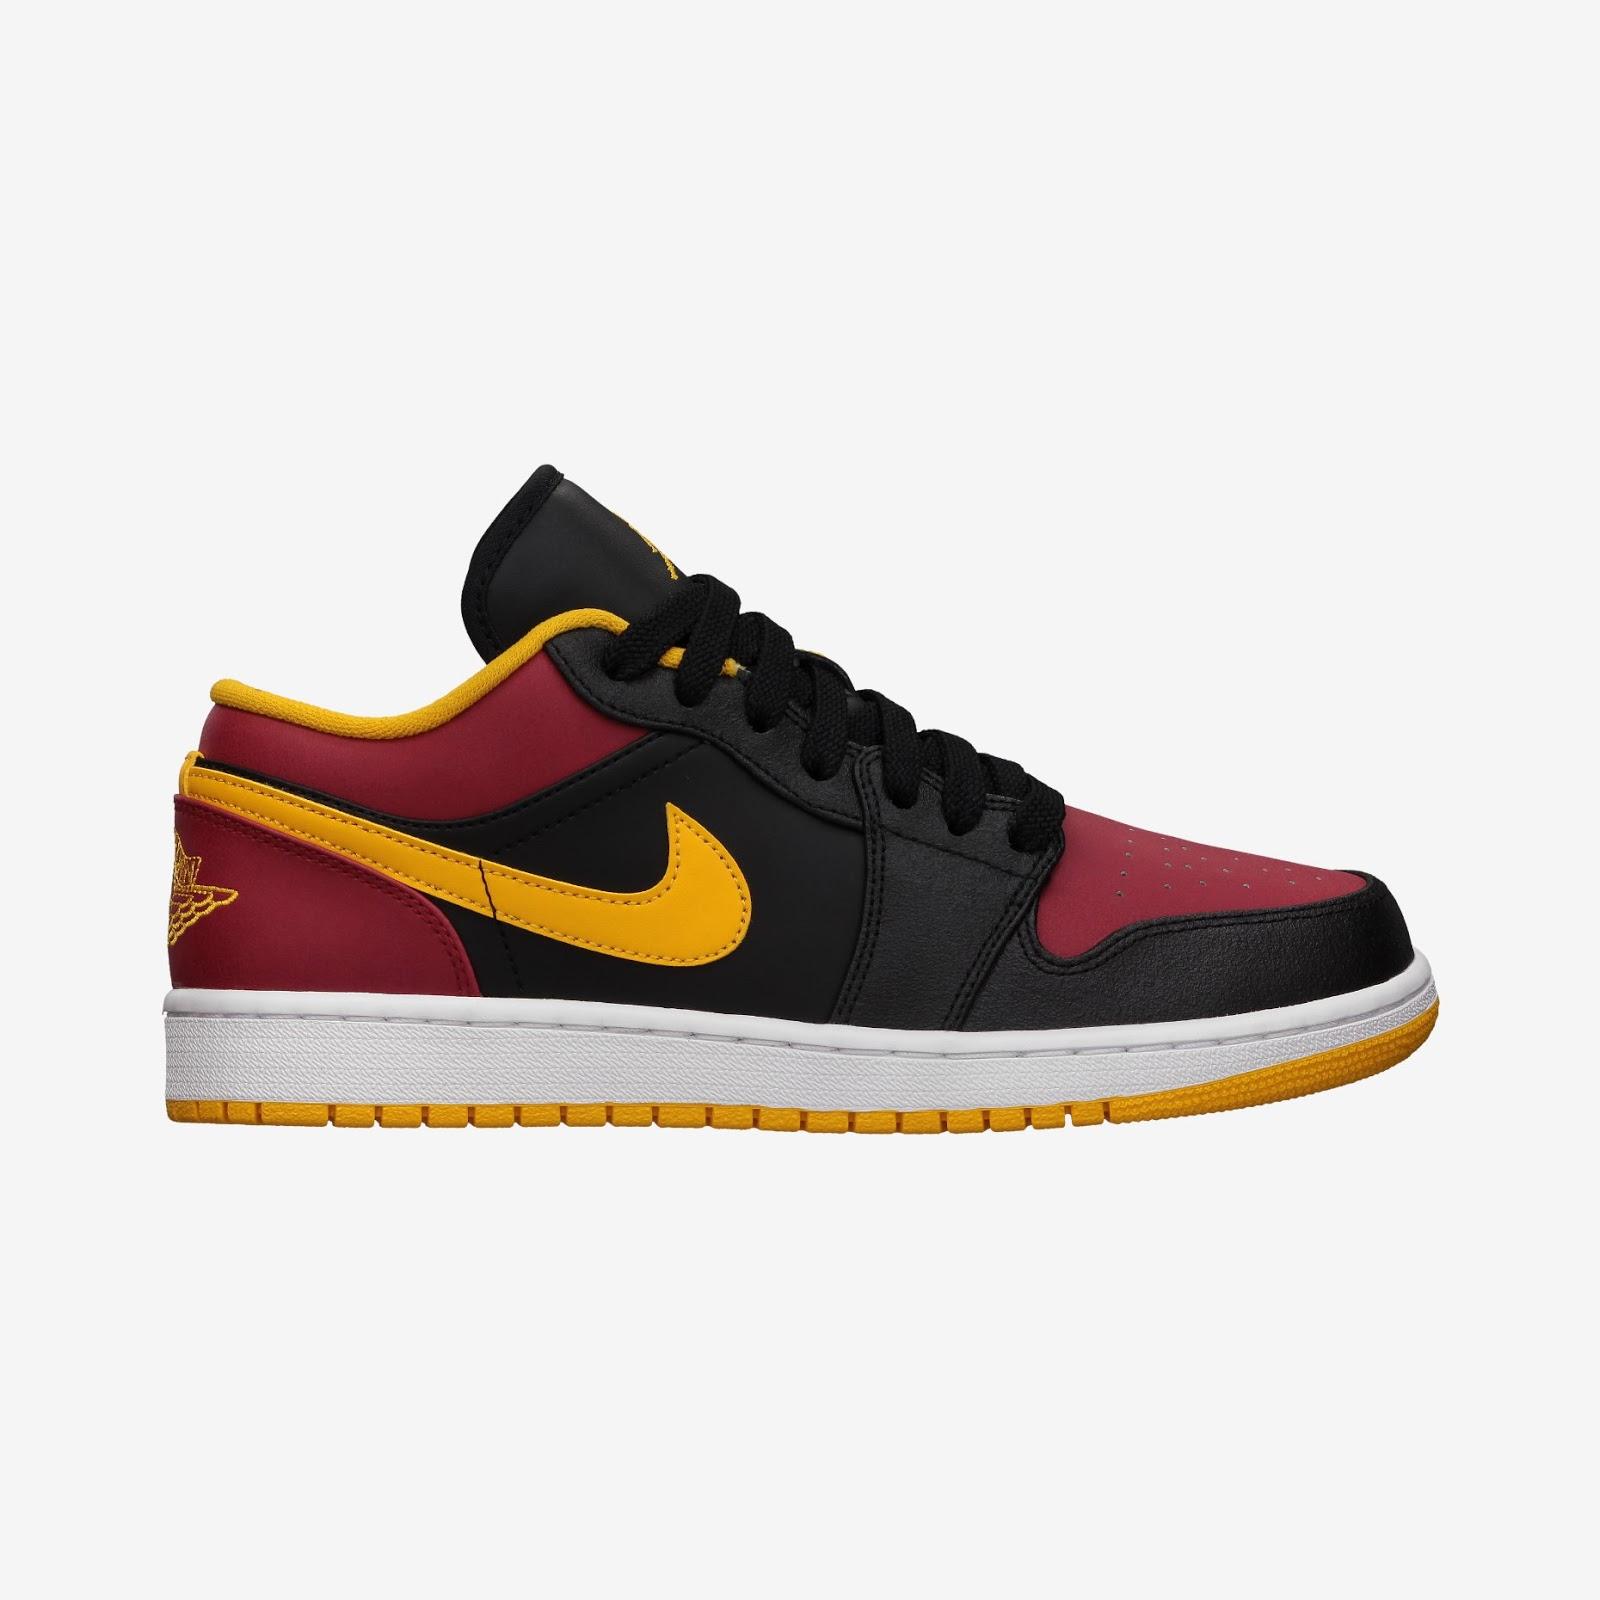 nike air retro basketball shoes and sandals air